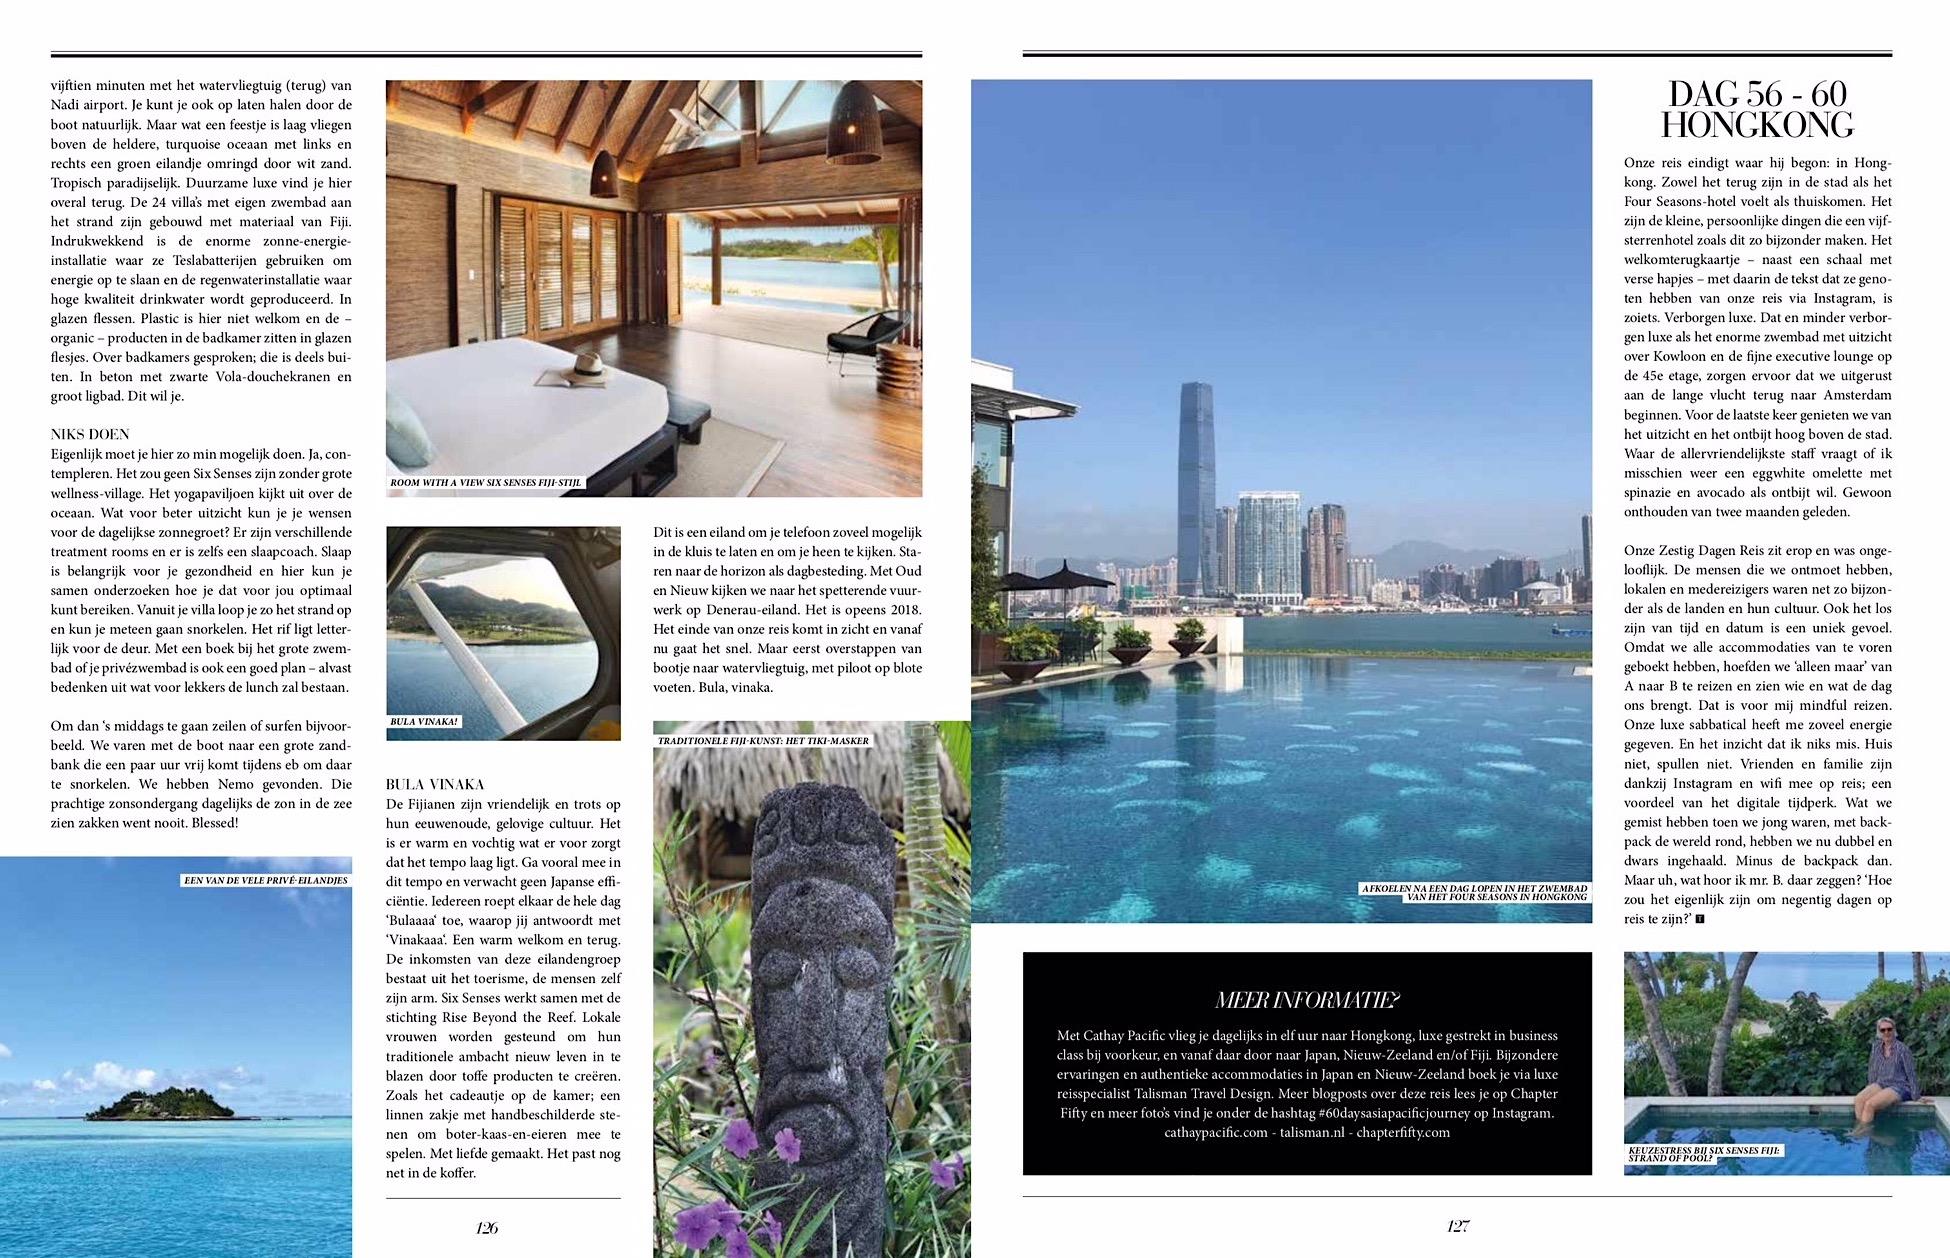 Luxury sabbatical Talkies Magazine Fiji Hong Kong